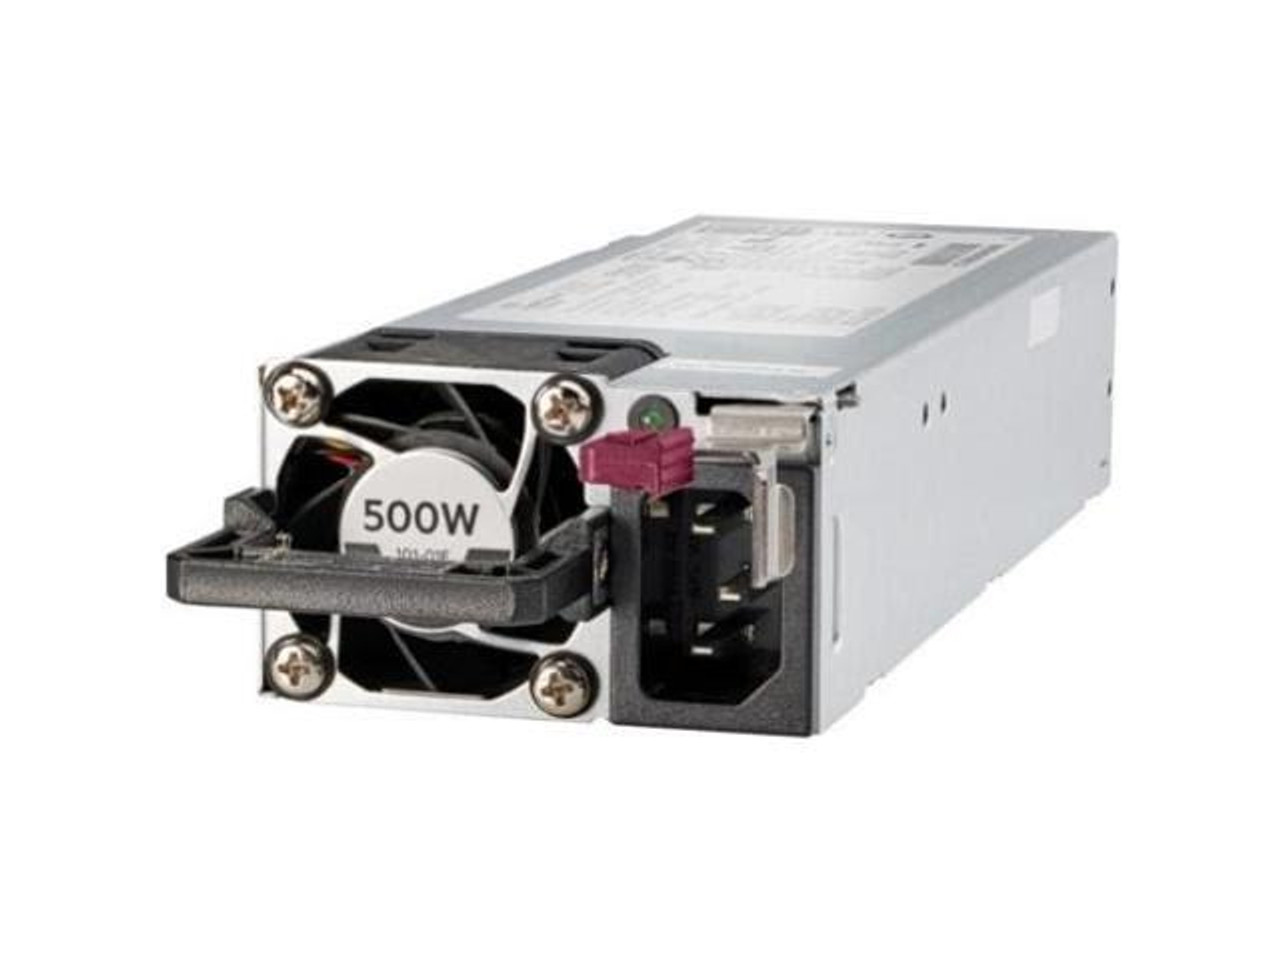 865408-B21 HPE 500W Flex Slot Platinum Hot Plug Power Supply 866729-001